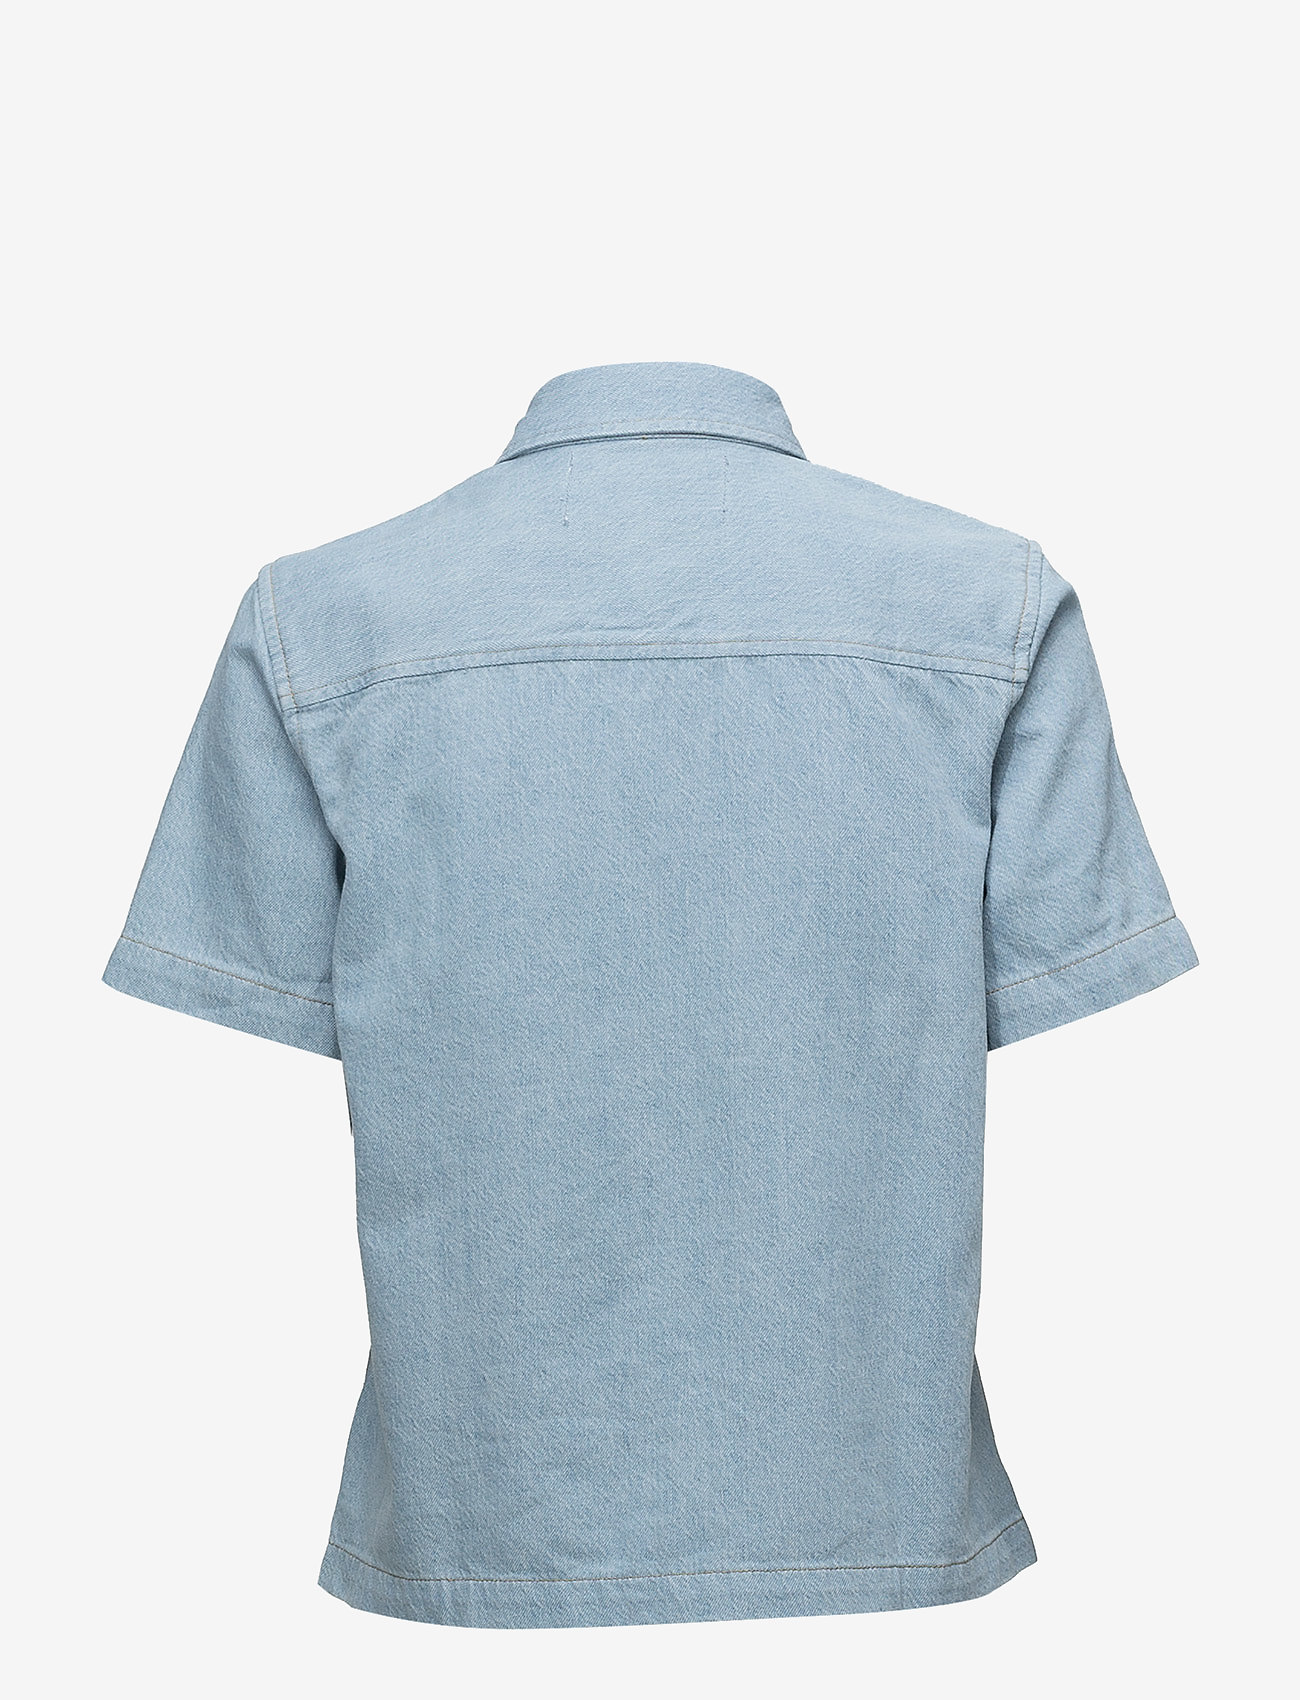 Calvin Klein Jeans Ss Boxy Shirt Blocke - Blusar & Skjortor Irwin Blue Blocked